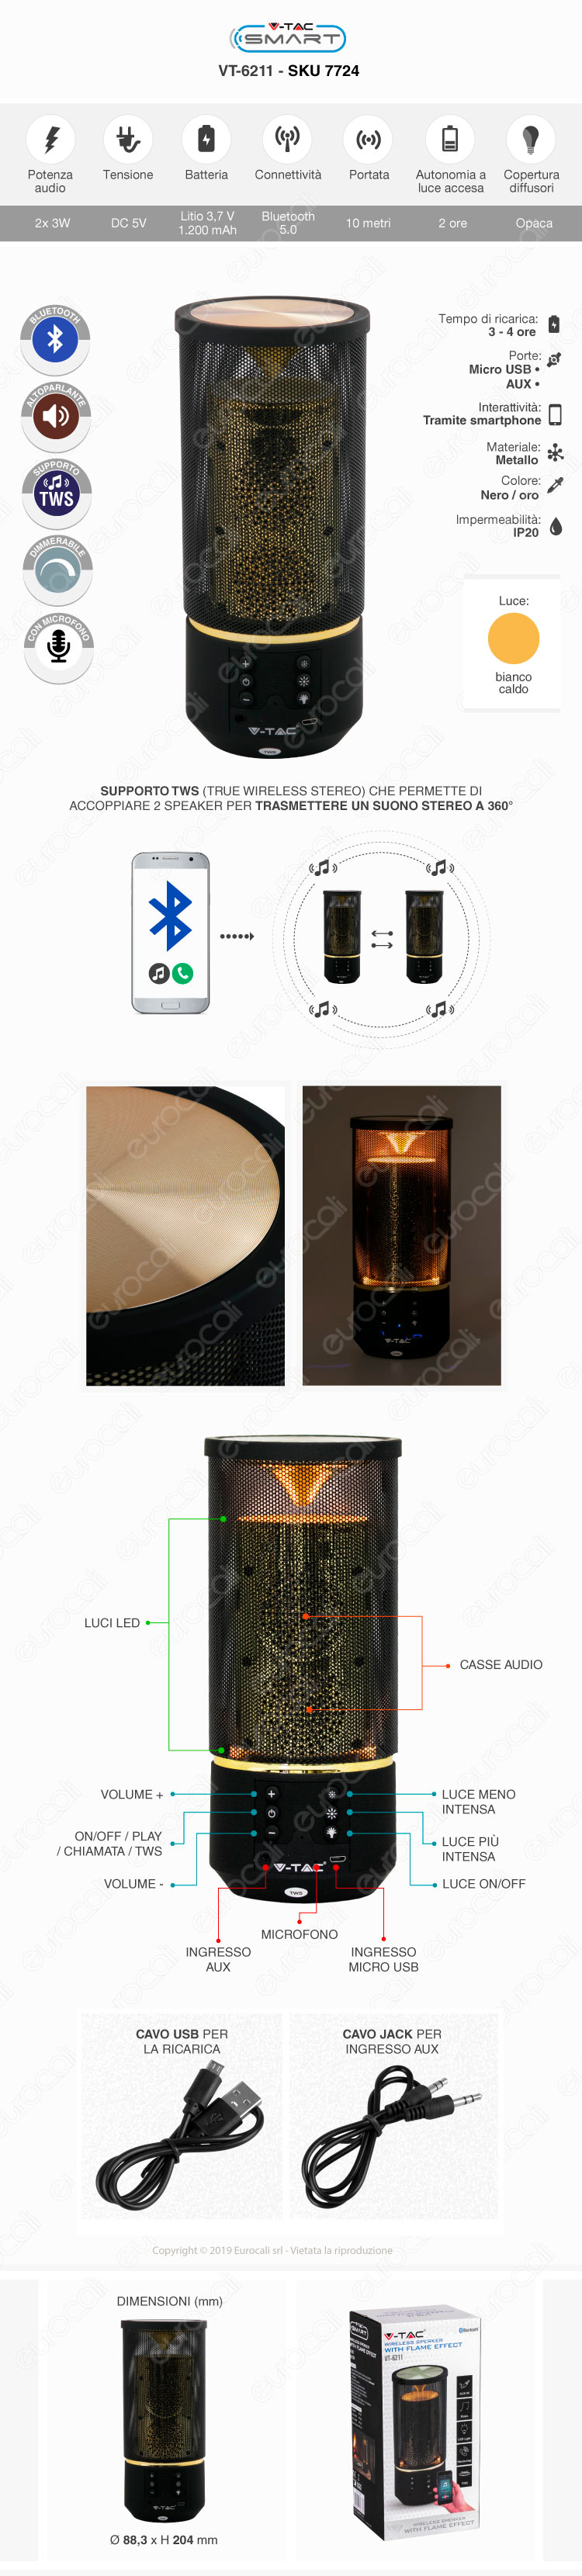 V-Tac VT-6211 Speaker Bluetooth Portatile 3W con LED RGB e Microfono Ingresso MicroSD AUX